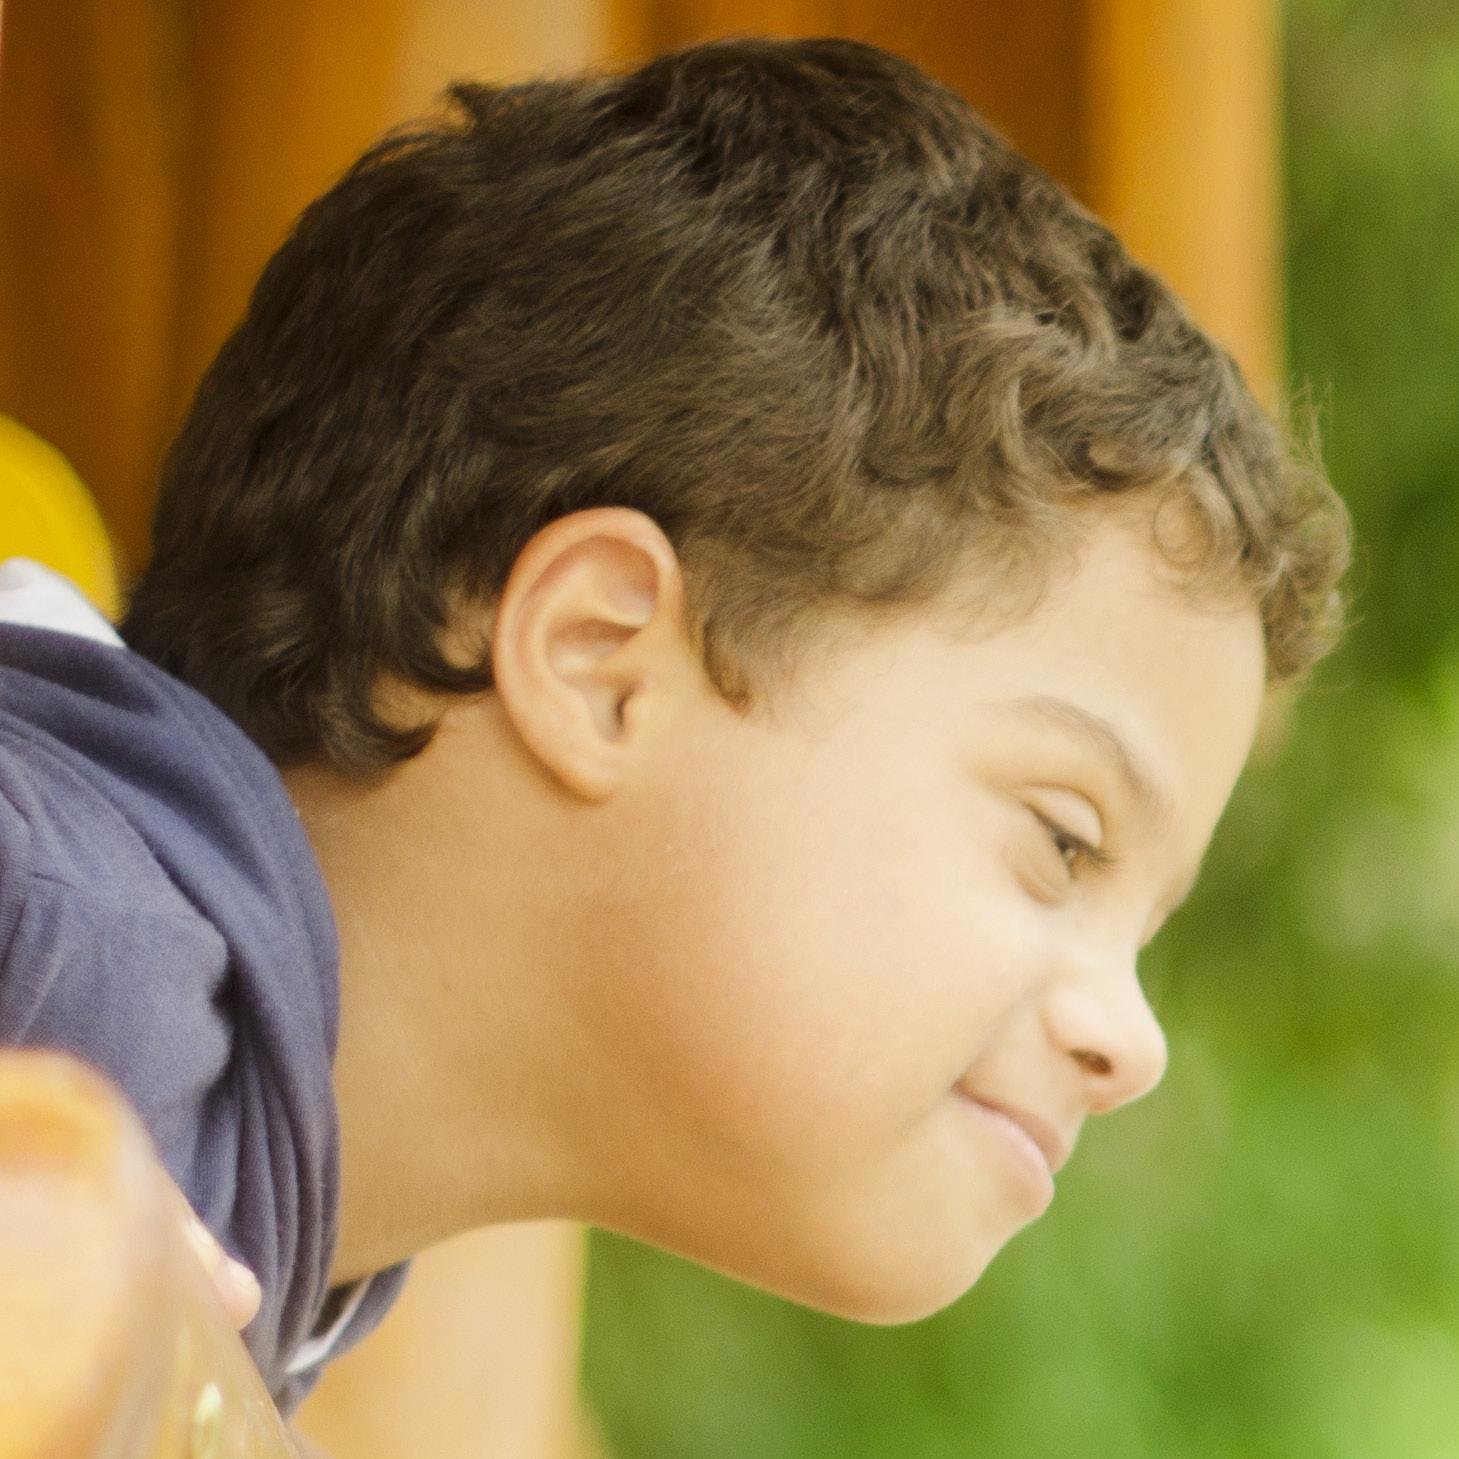 O metabolismo do hormônio da tireoide na síndrome de Down